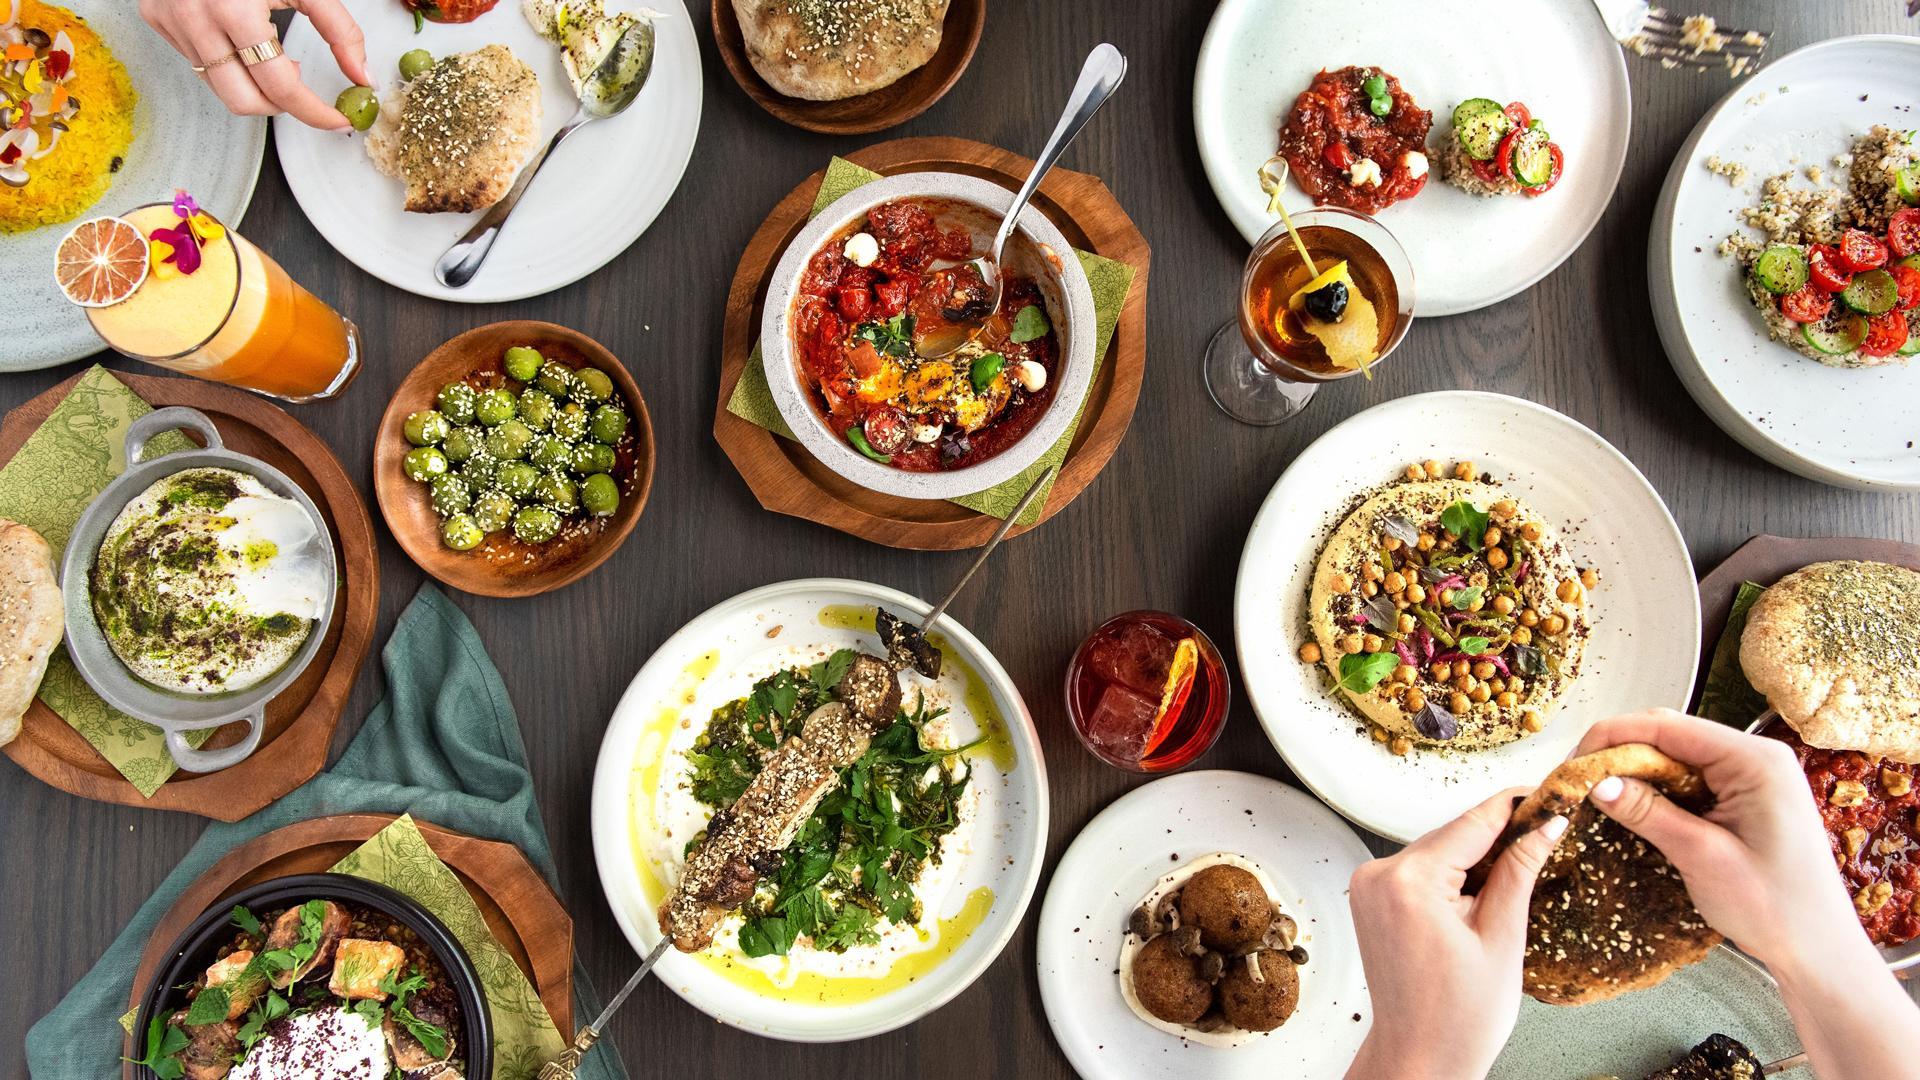 Shook Israeli restaurant in Toronto